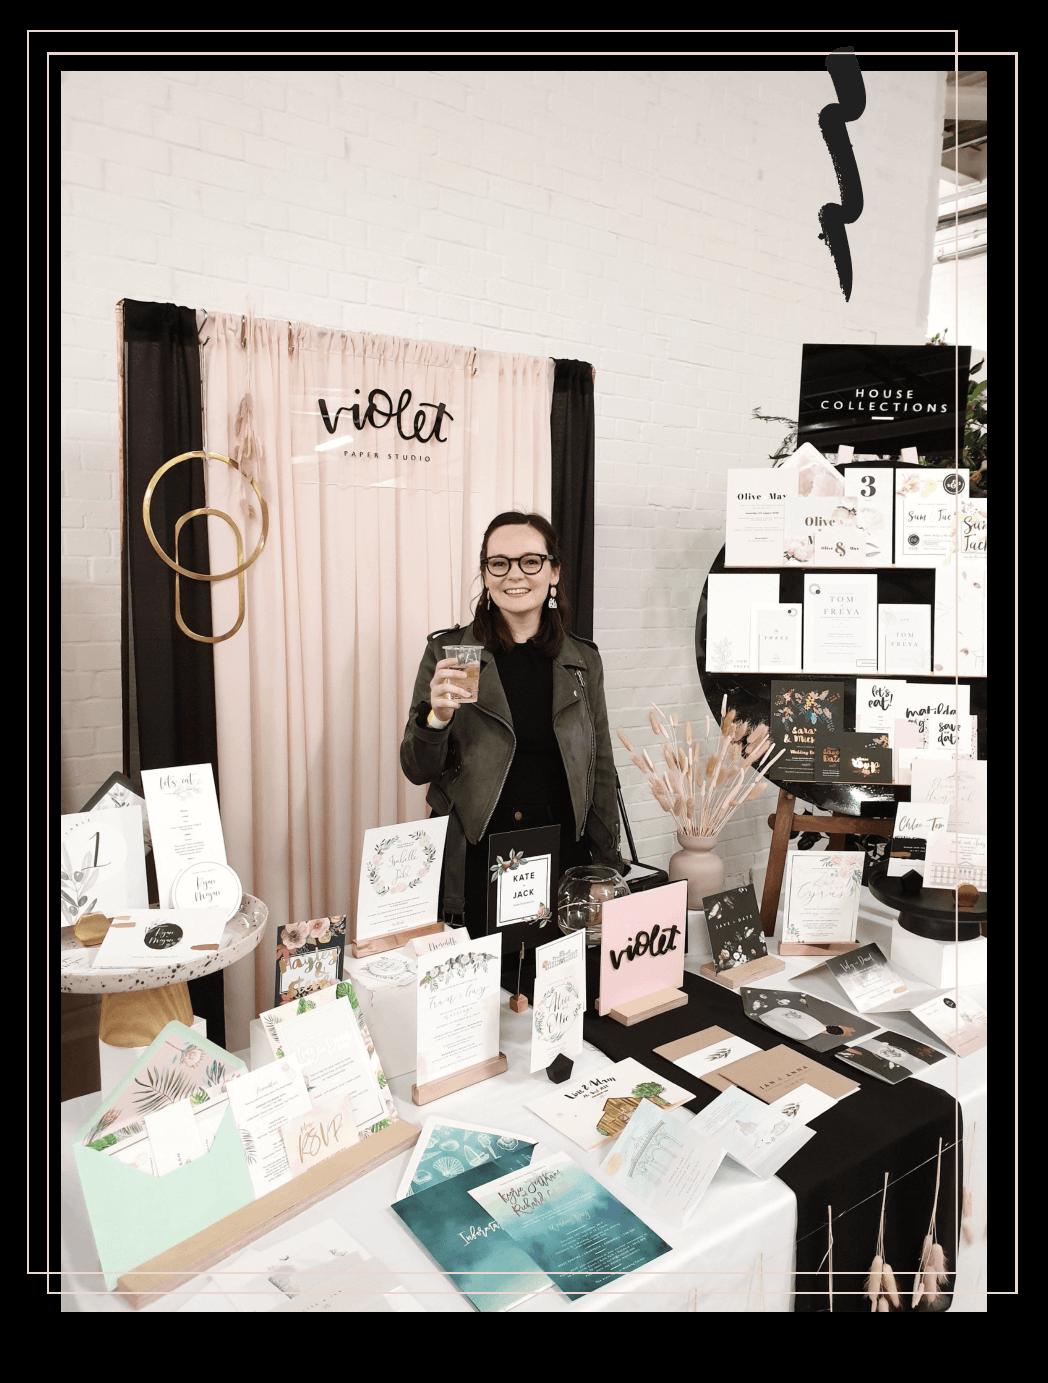 Violet-Paper-Studio-Most-Curious-Wedding-Fair.png